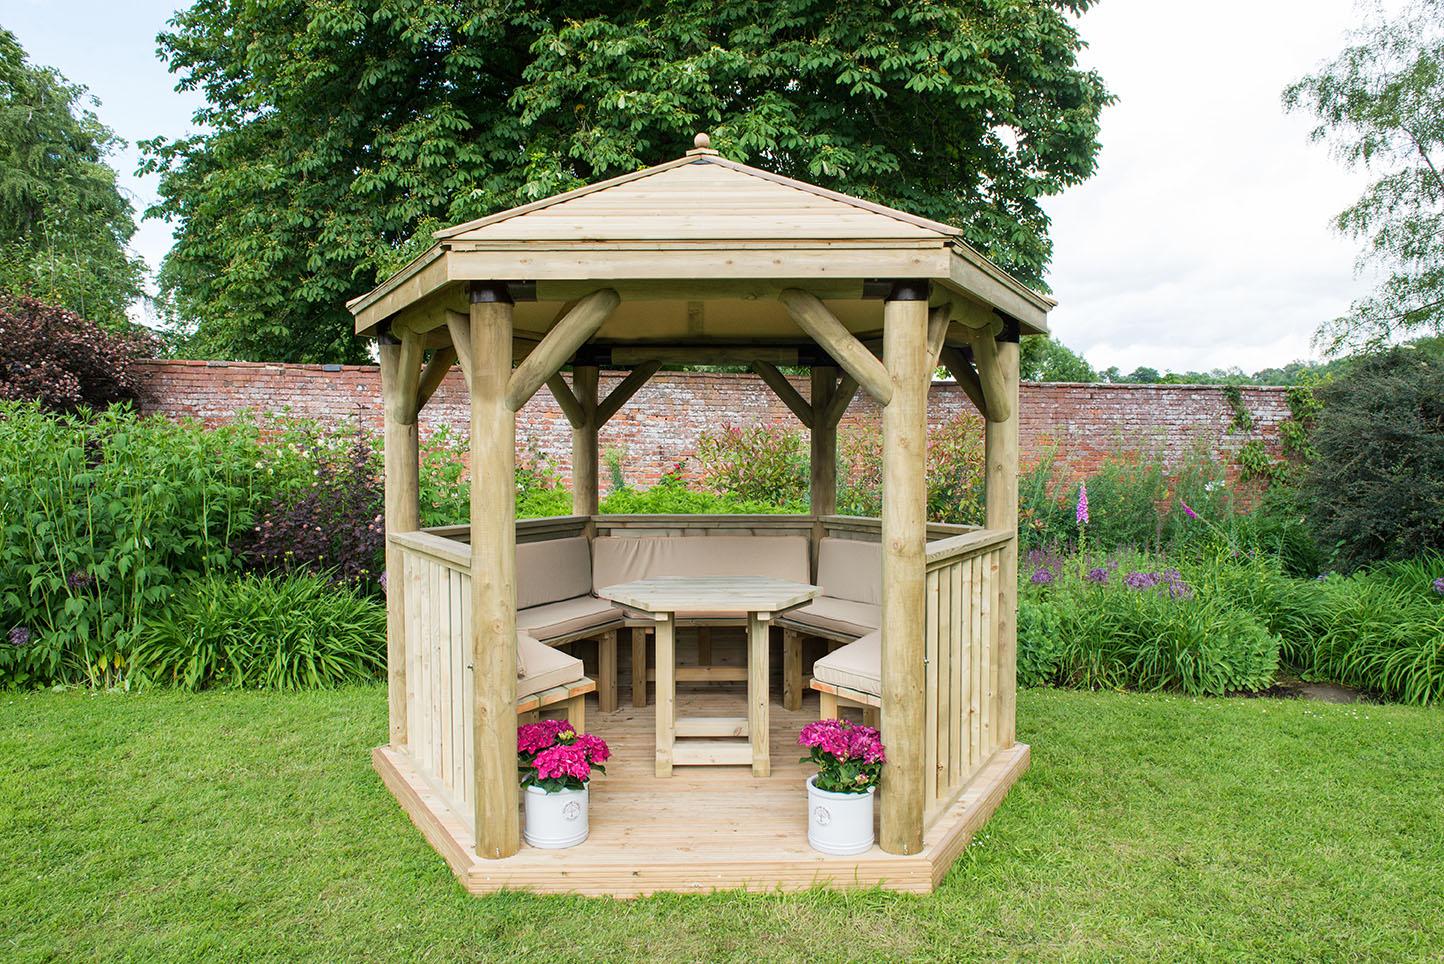 3m Premium Hexagonal Wooden Garden Gazebo with Timber Roof ...